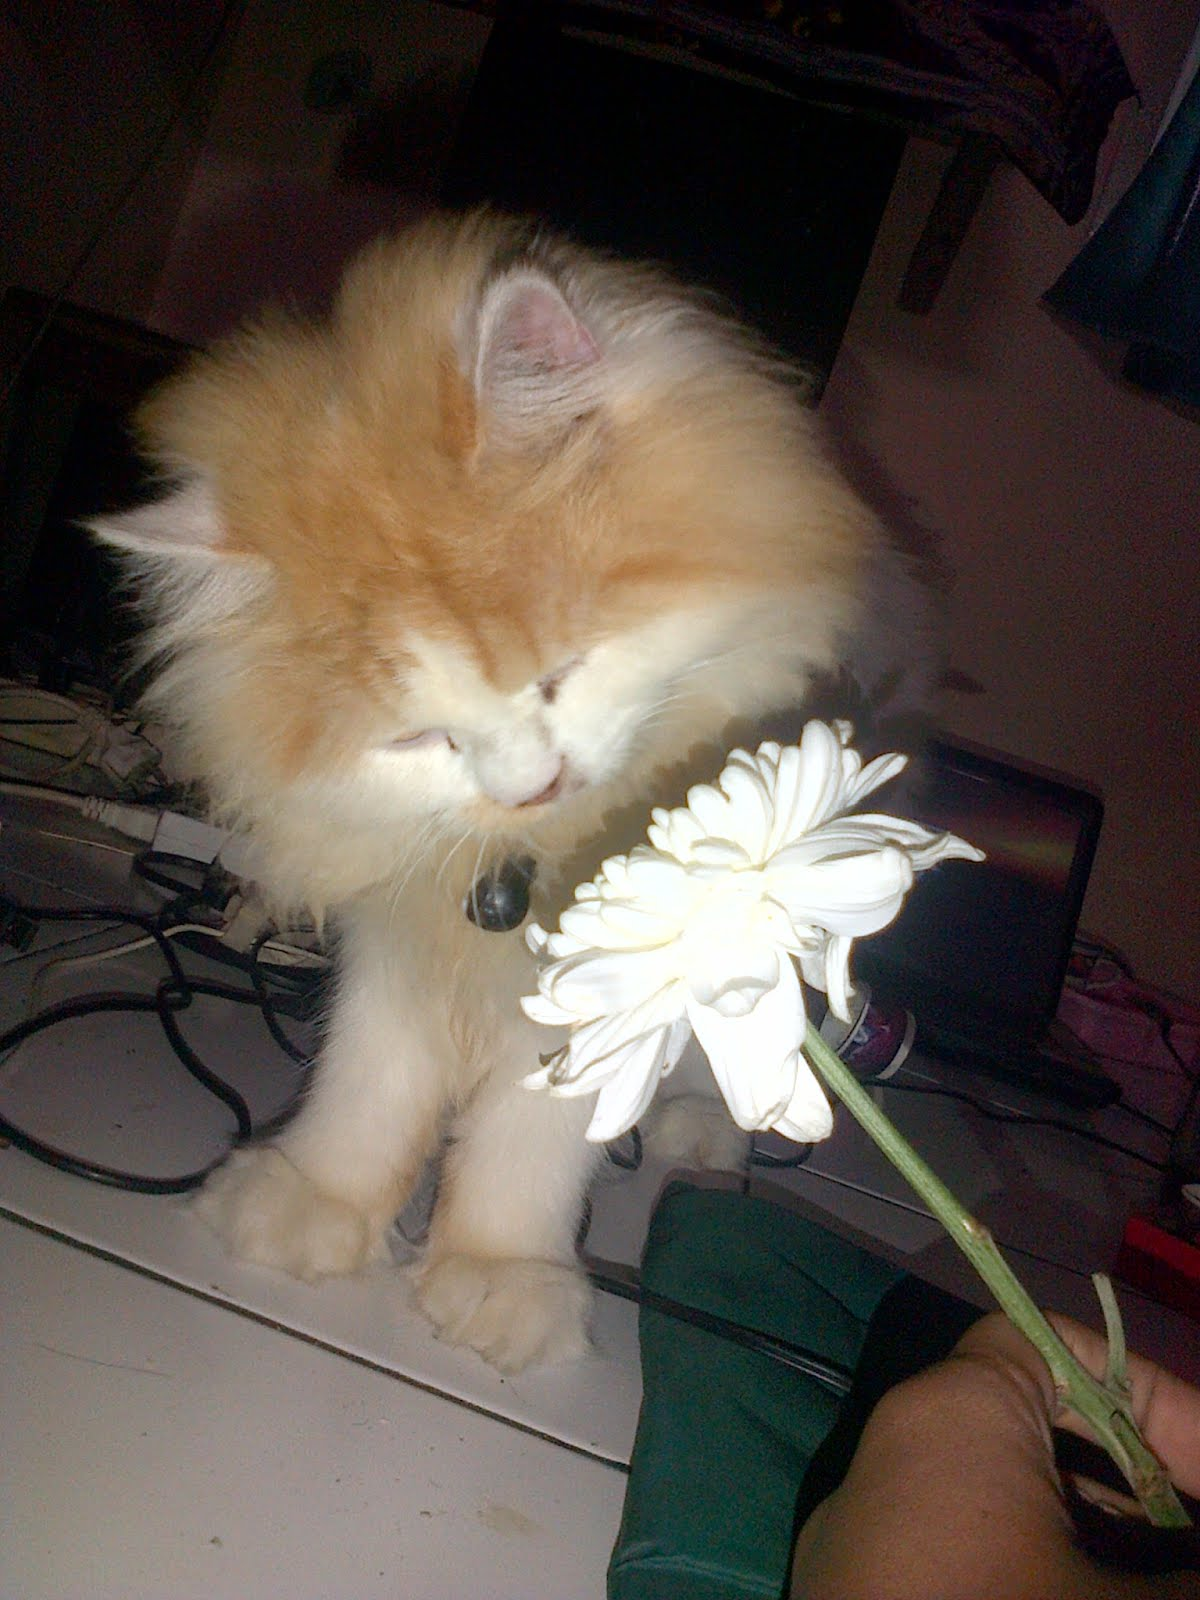 Fakta Ilmiah Mengapa Rasulullah Memelihara Kucing Haedar Alwi Assegaf